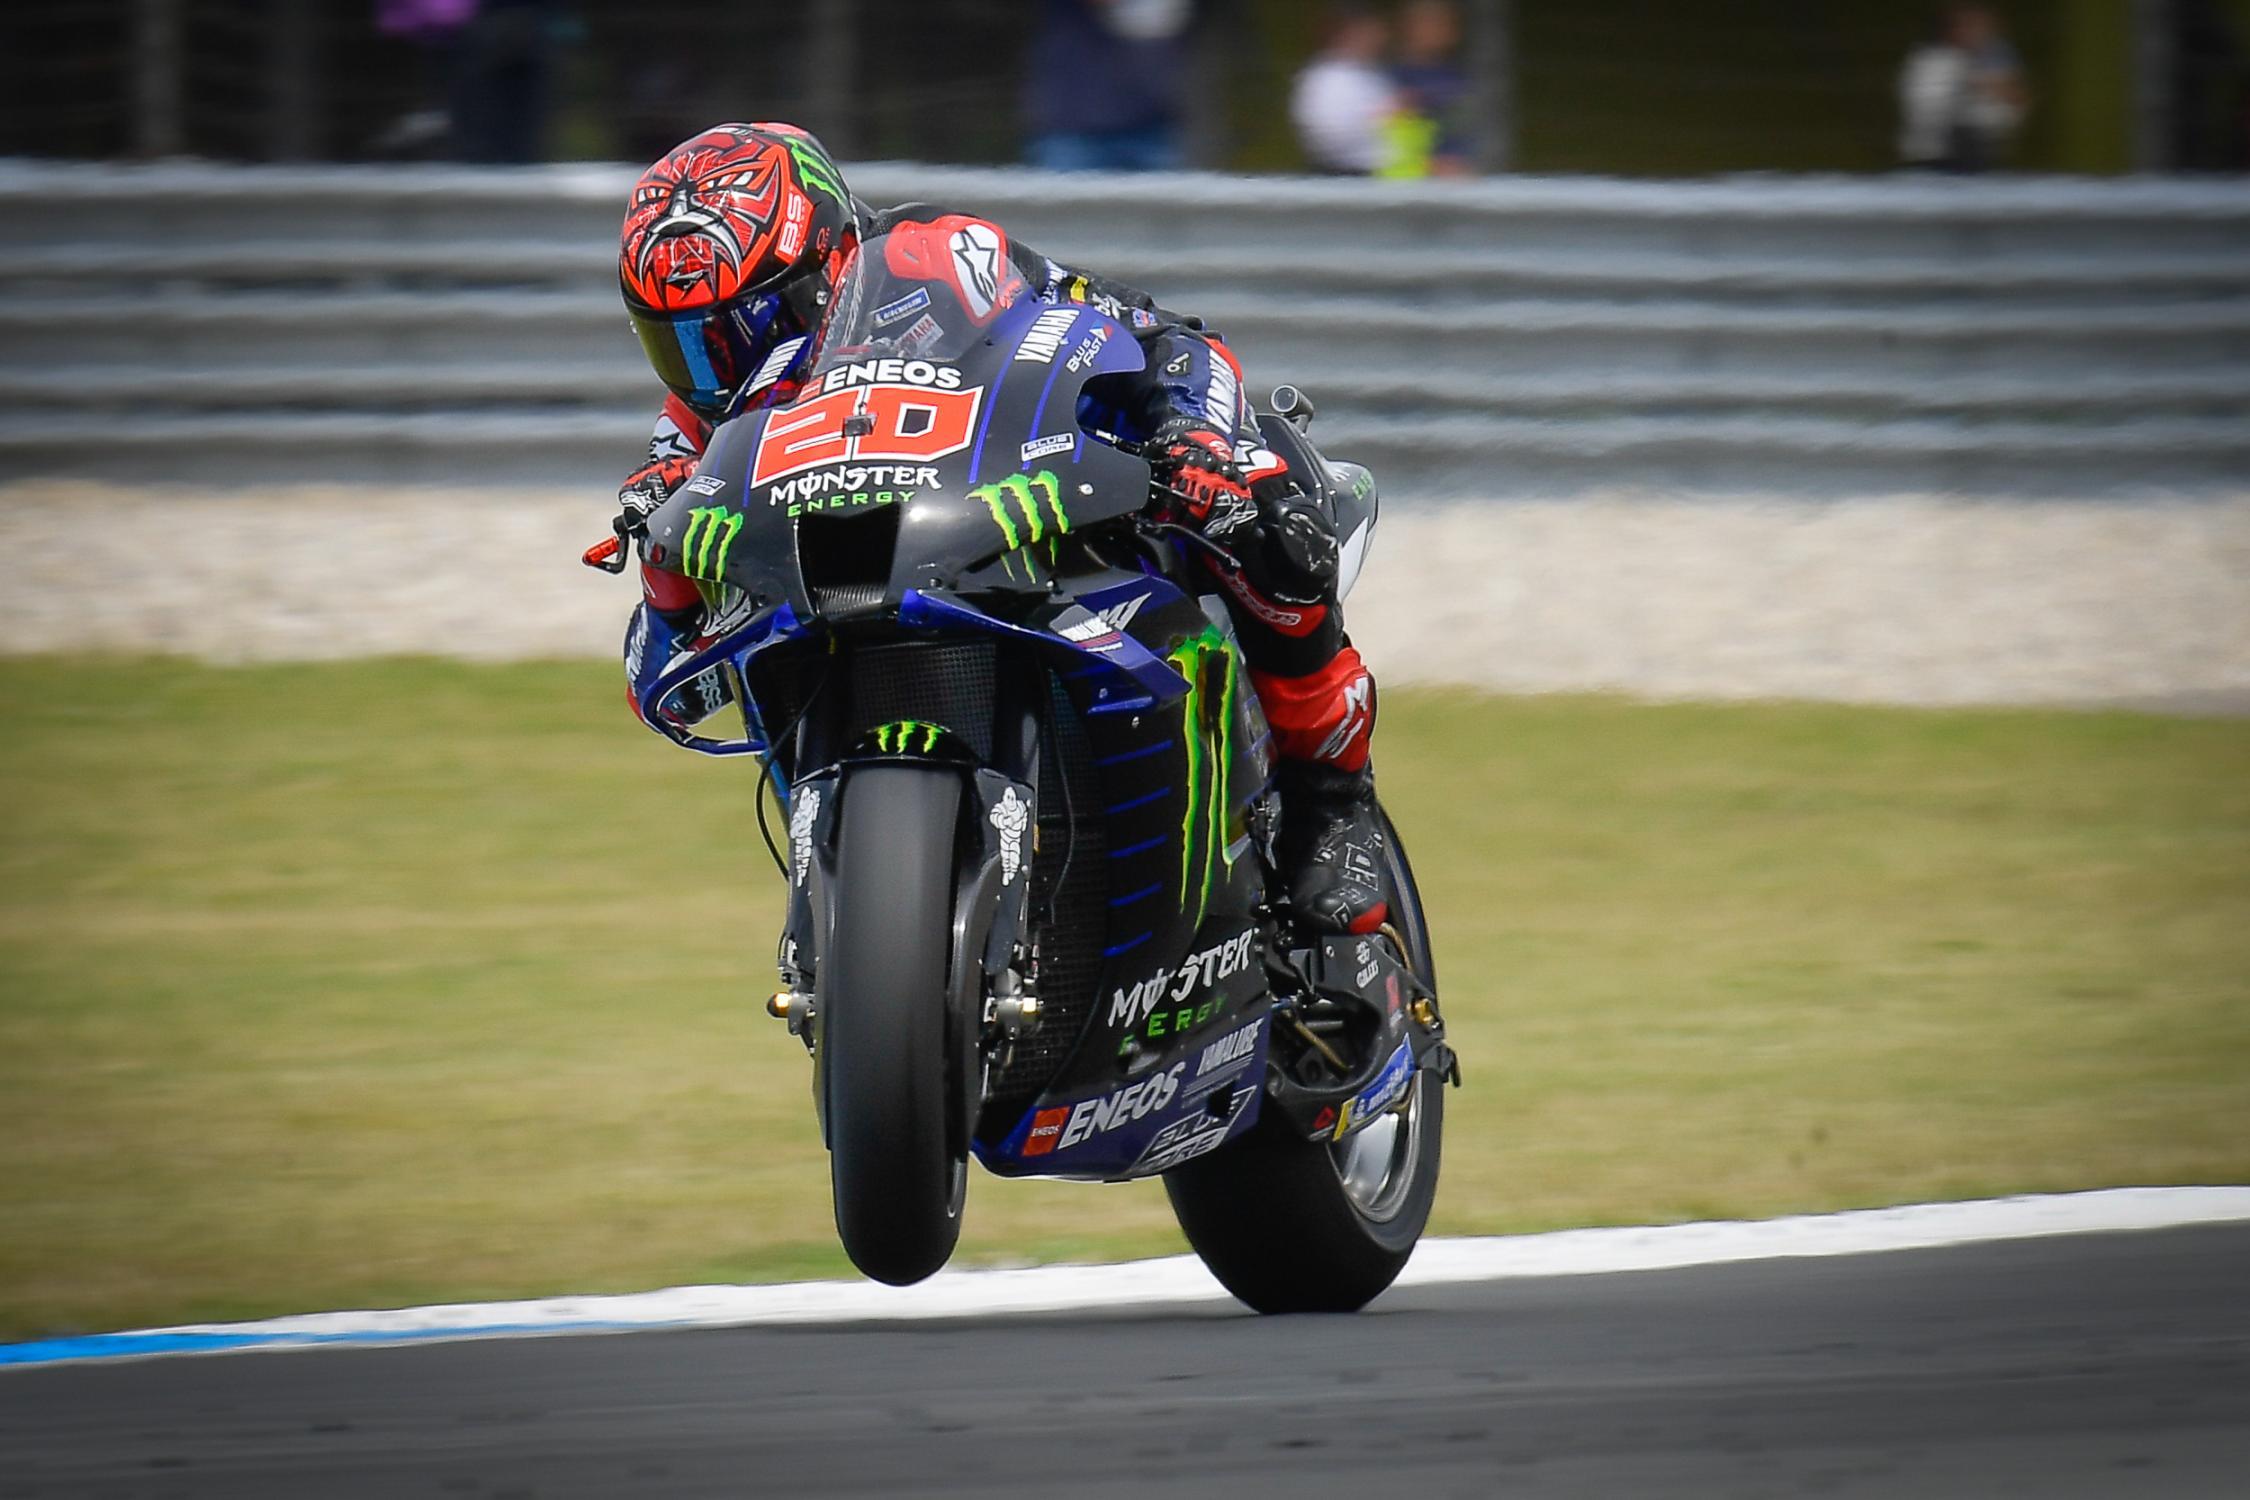 Gp di Assen, risultati gara: Quartararo vince, doppietta Yamaha.